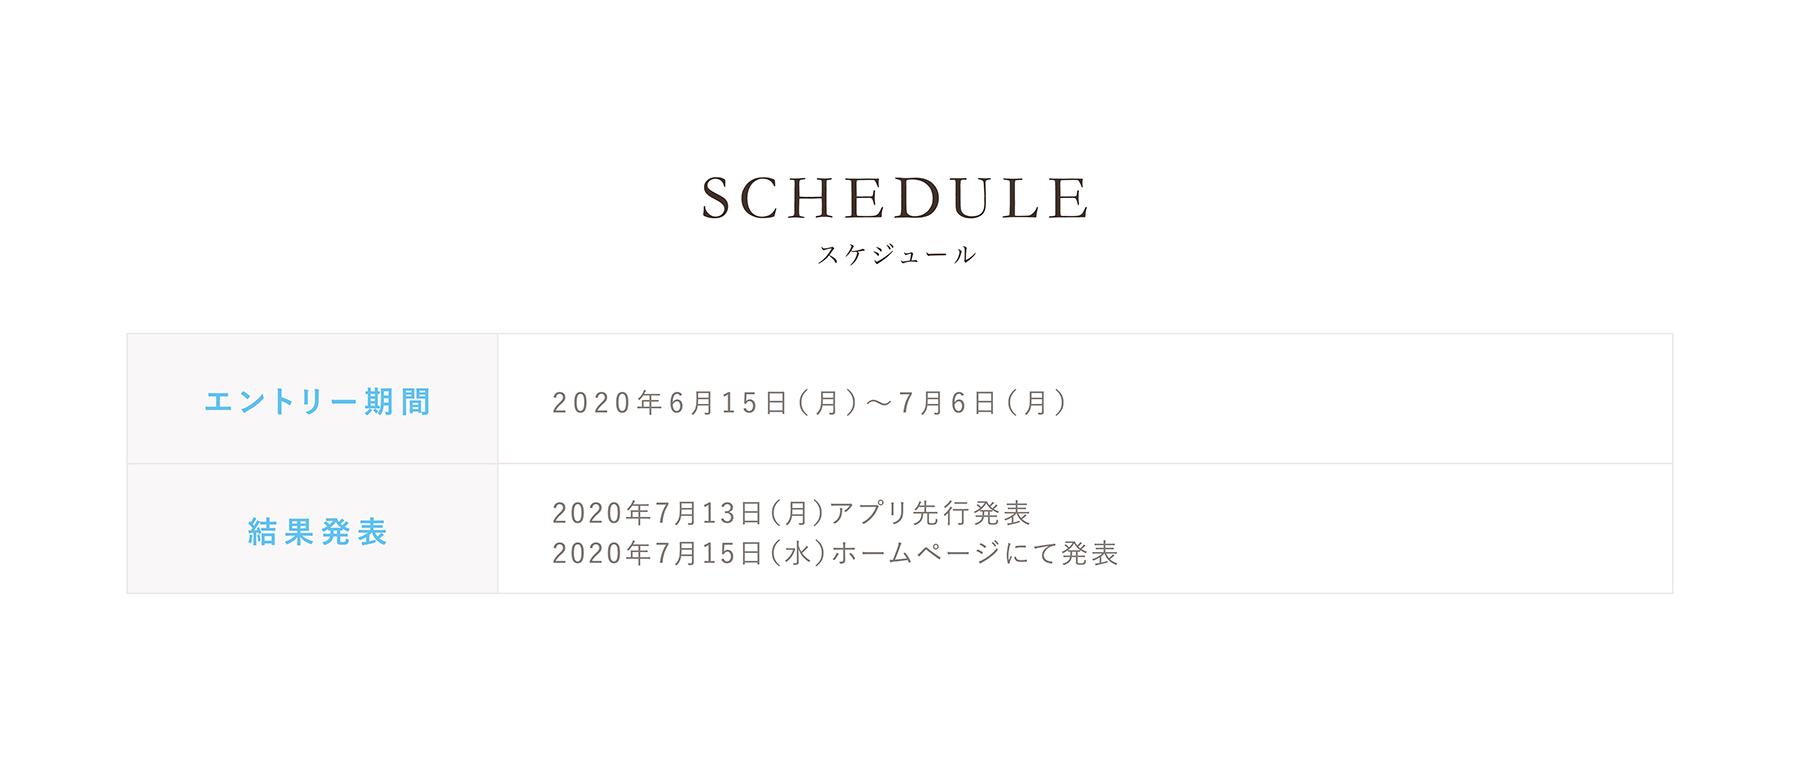 SCHEDULE スケジュール PRIZE 賞品・賞金 ATTENTION 注意事項